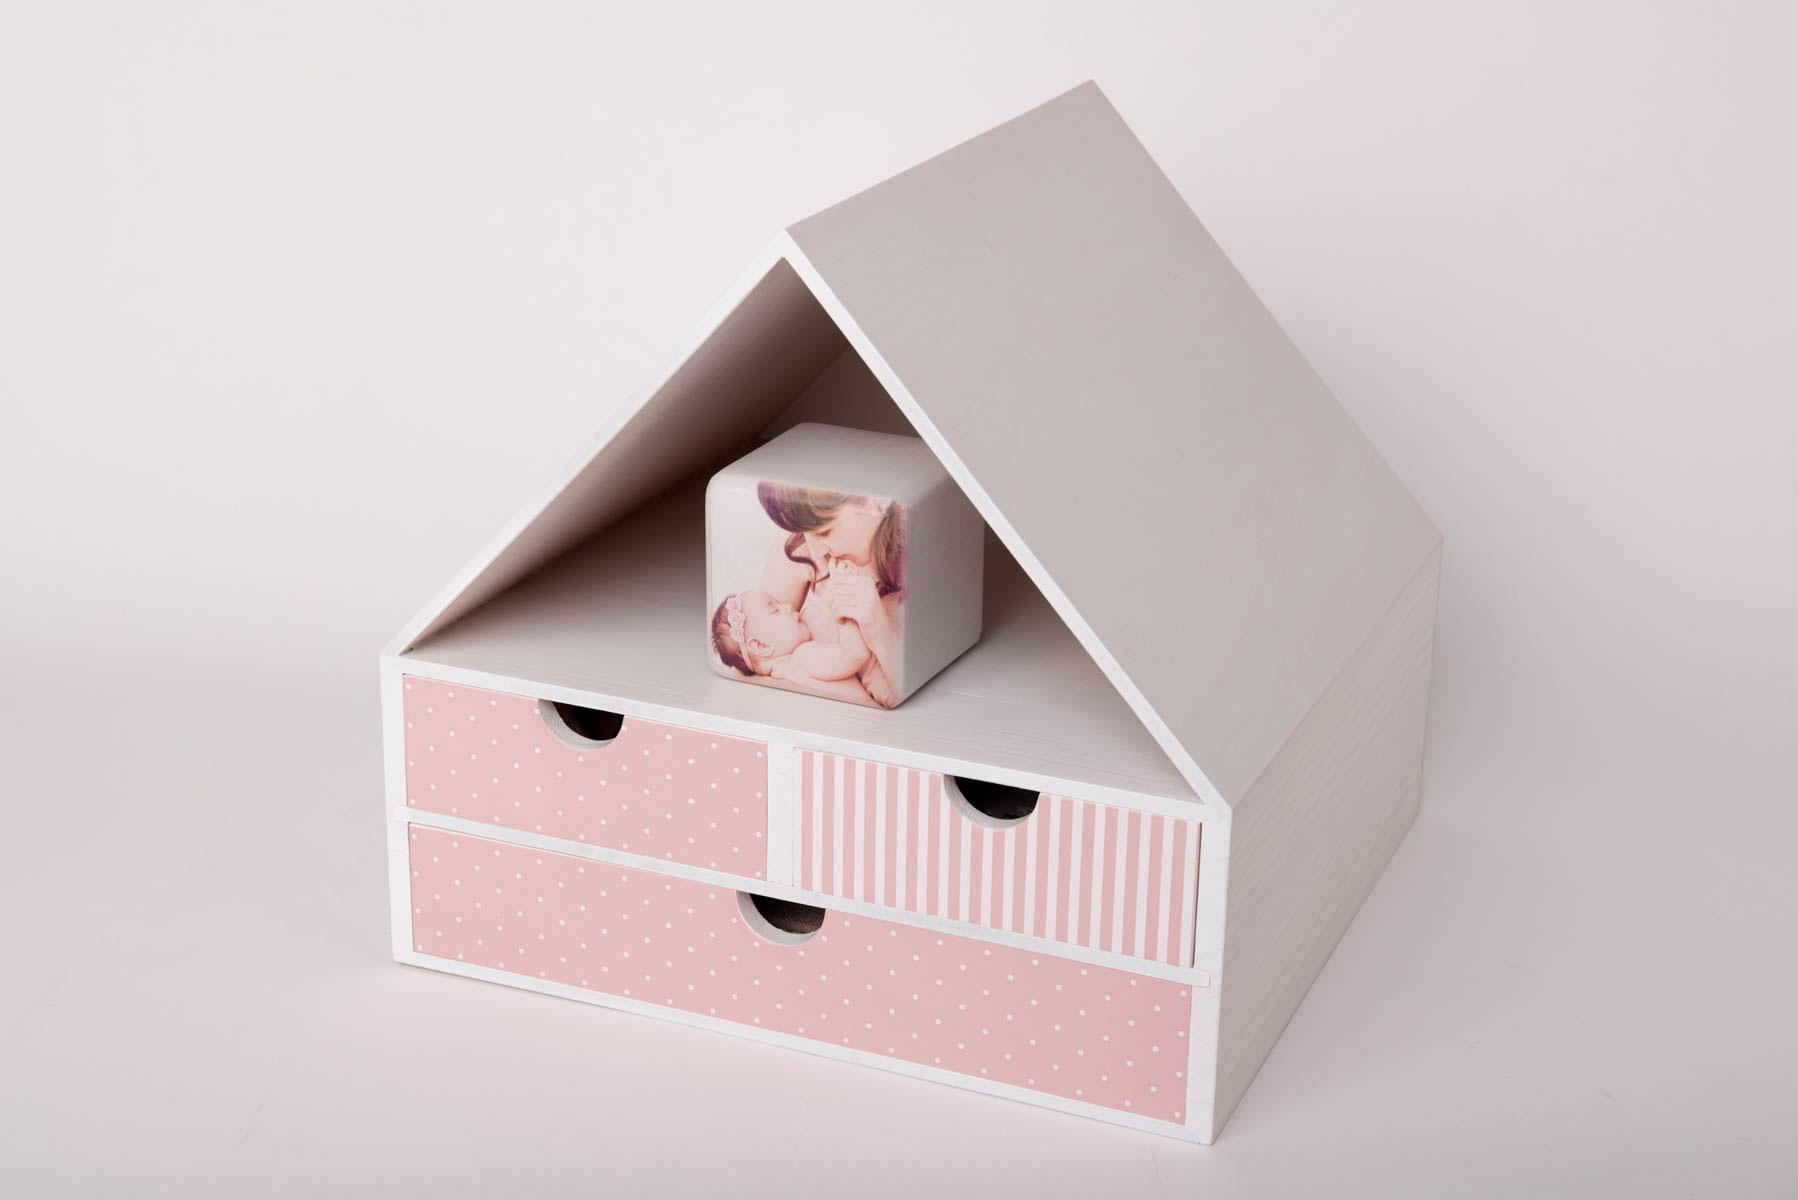 producto-newborn-casa-de-madera-00